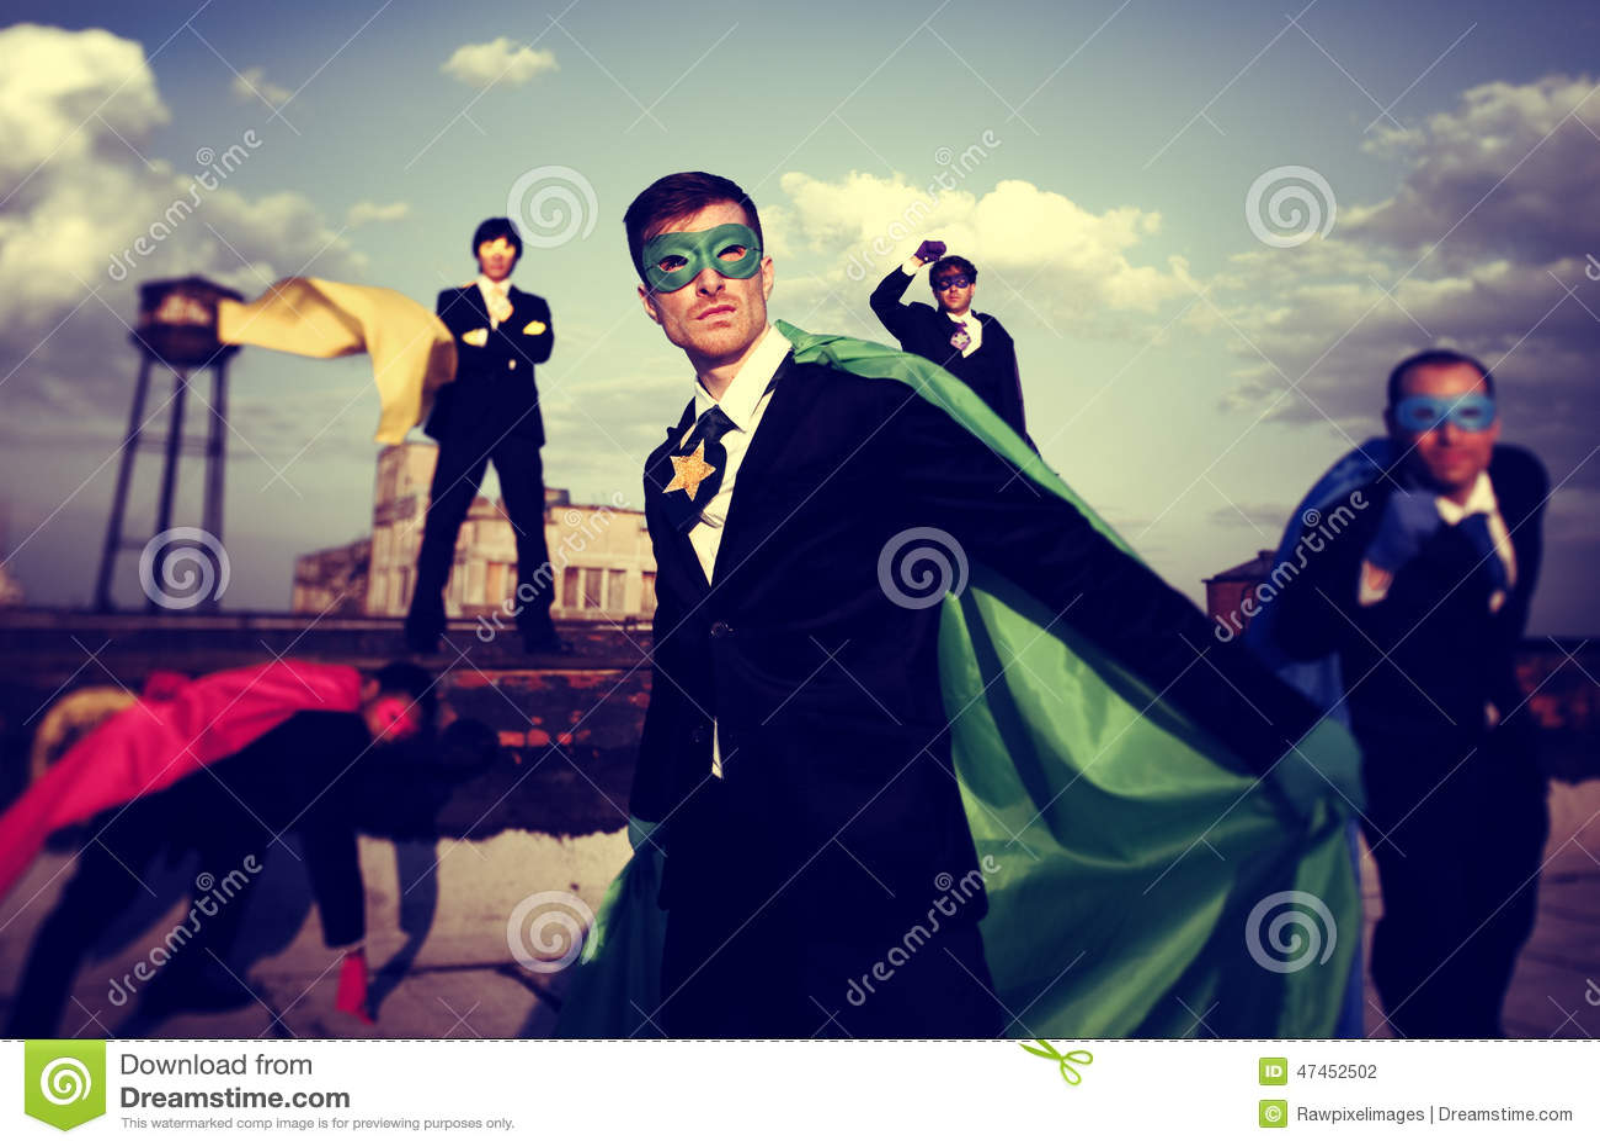 Business People Superhero Confidence Team Work Concept